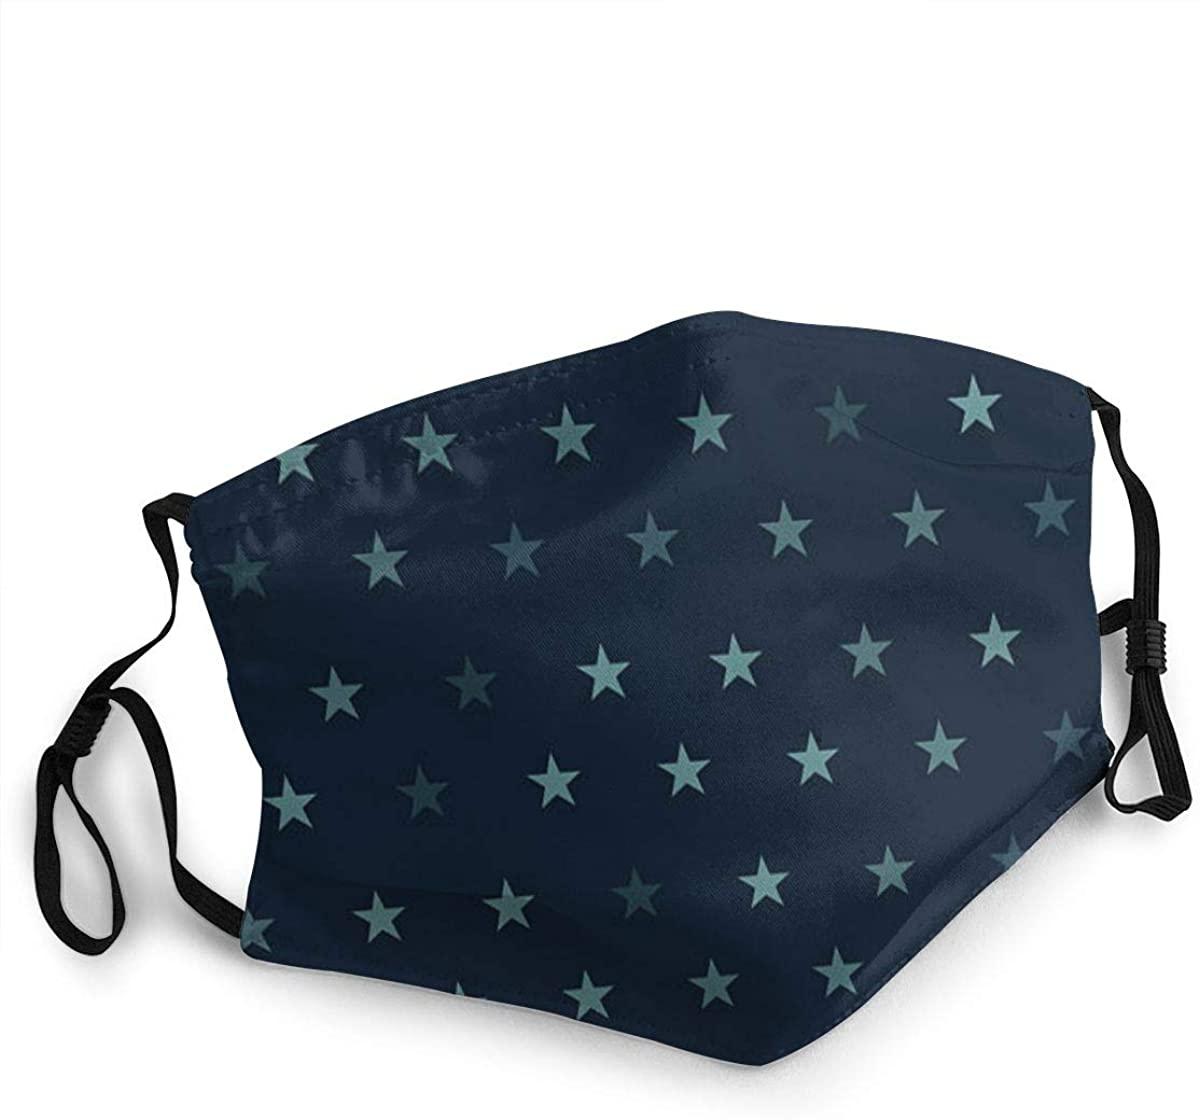 MARTHLORES Fashion Protective, Reusable Cotton Fabric Star Unisex Cotton, Washable,Adjustable, Reusable.